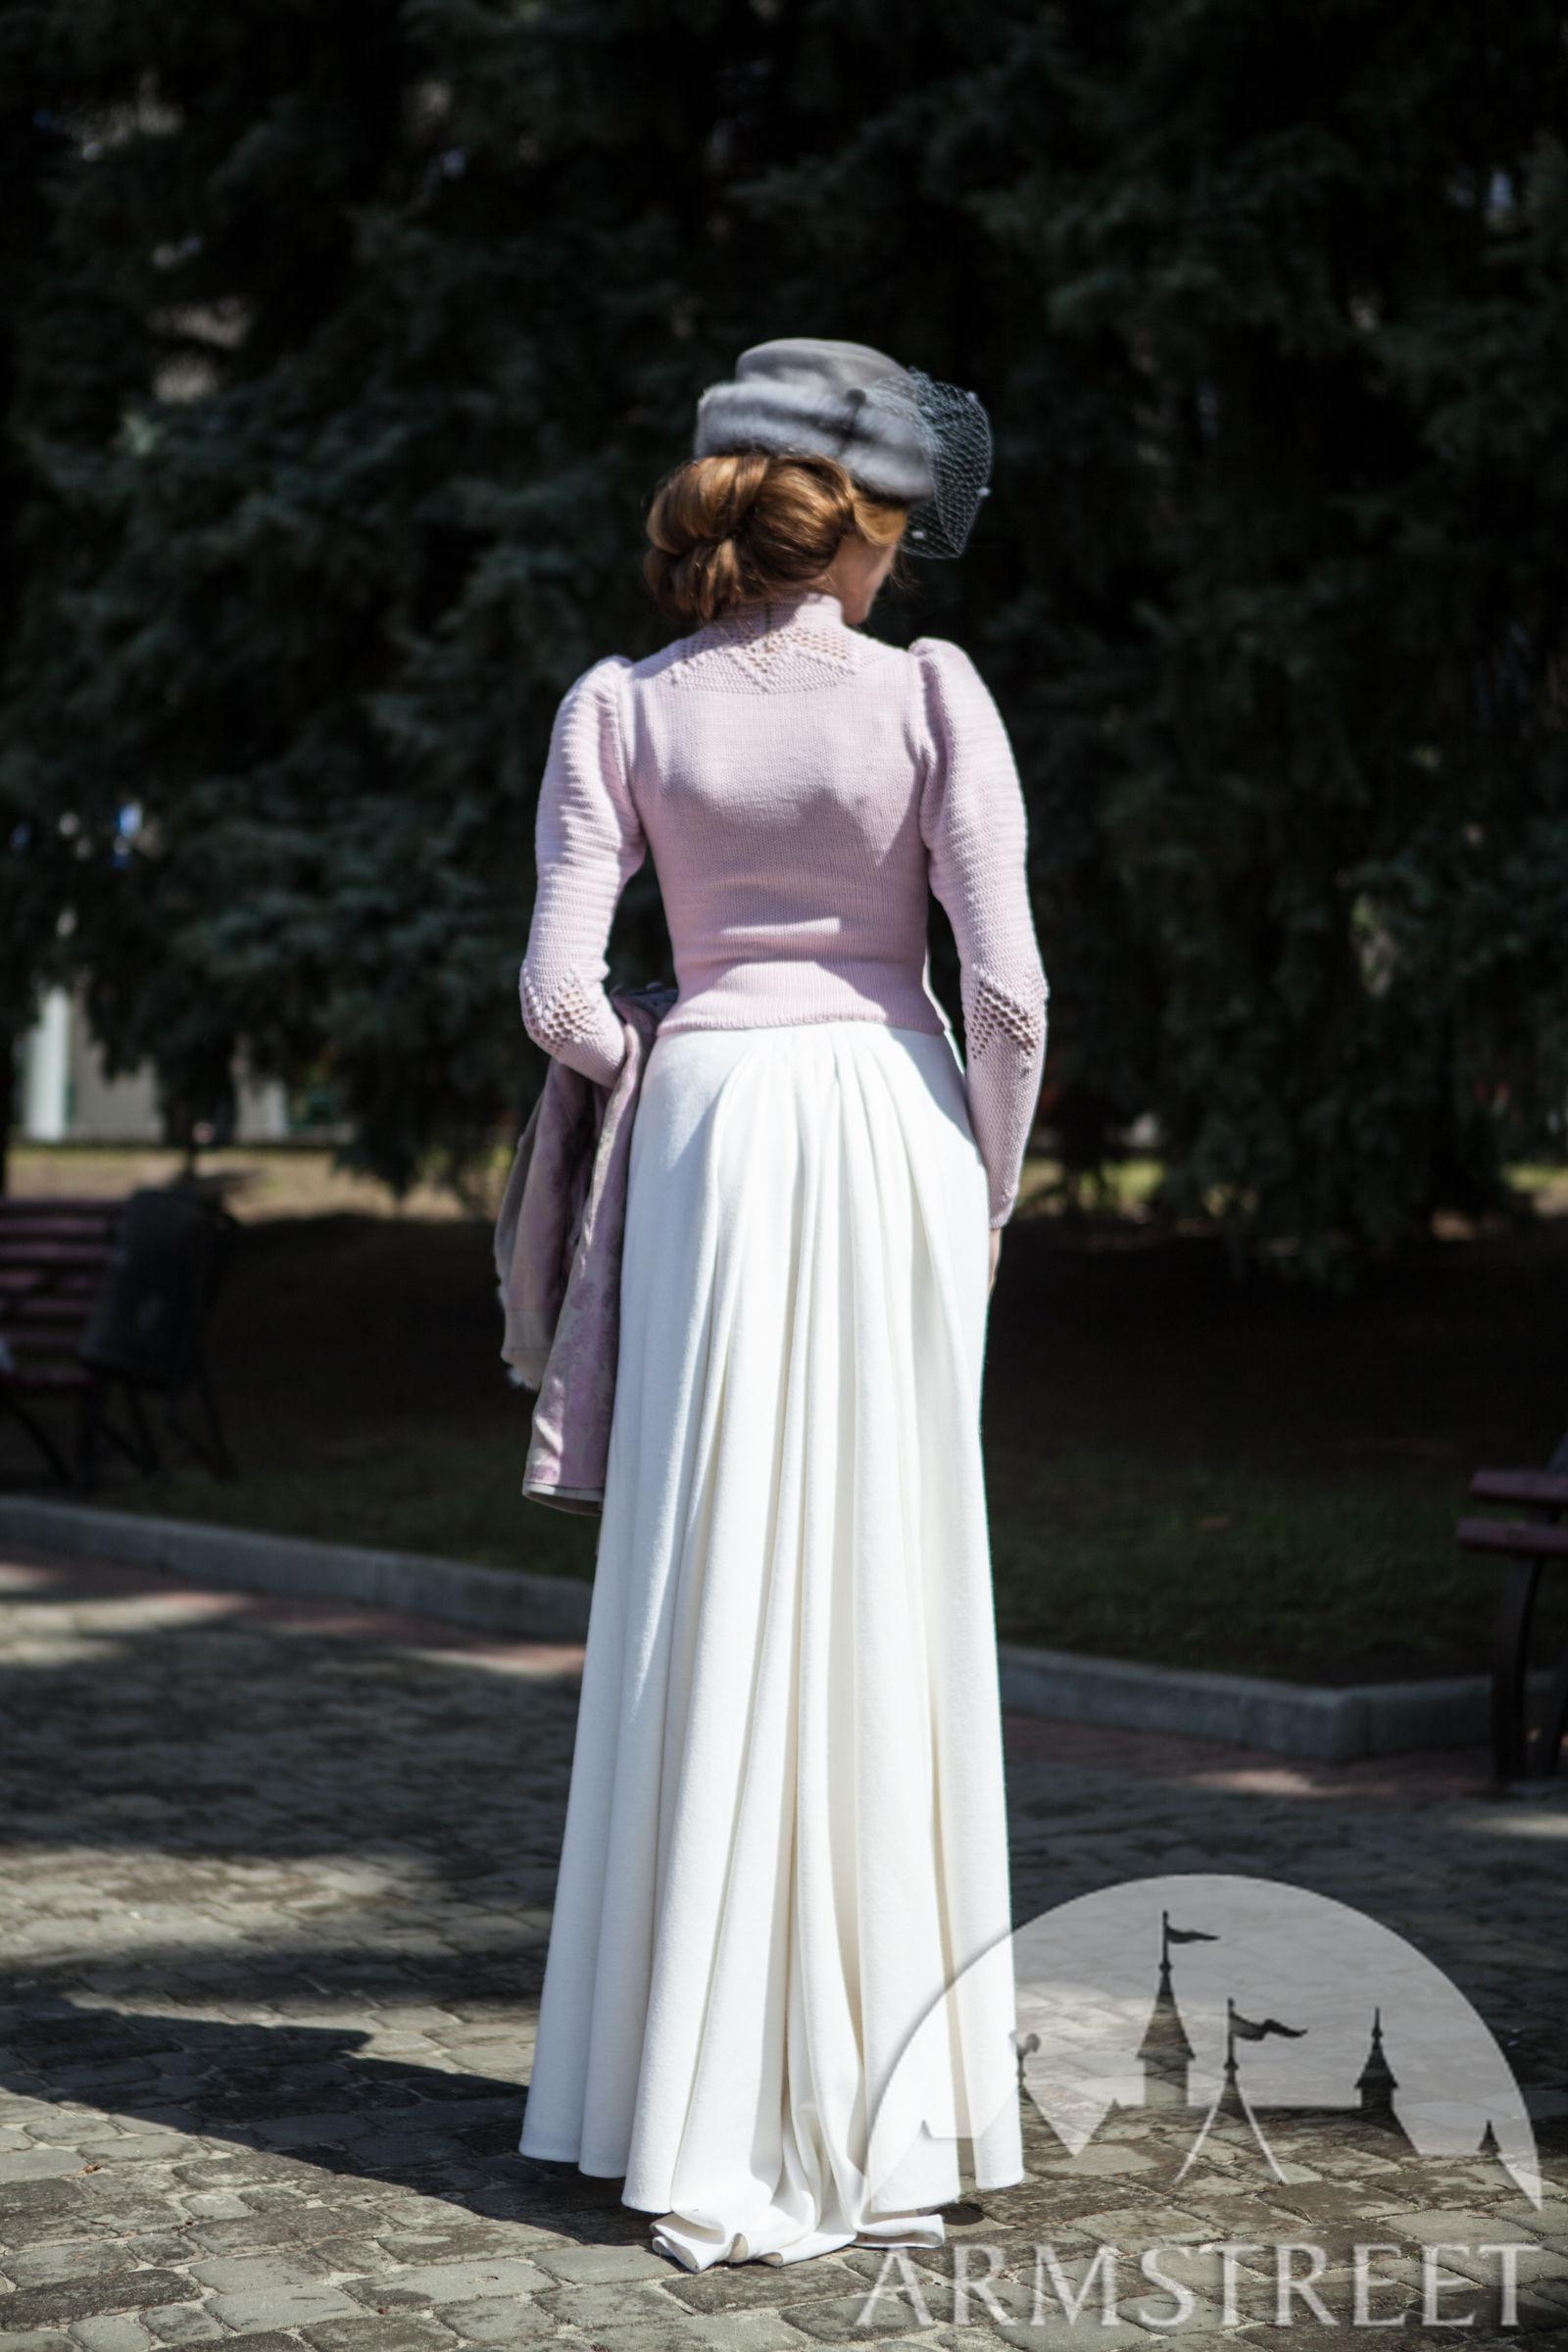 Edwardian Skirt Fleur De Lis For Sale Available In